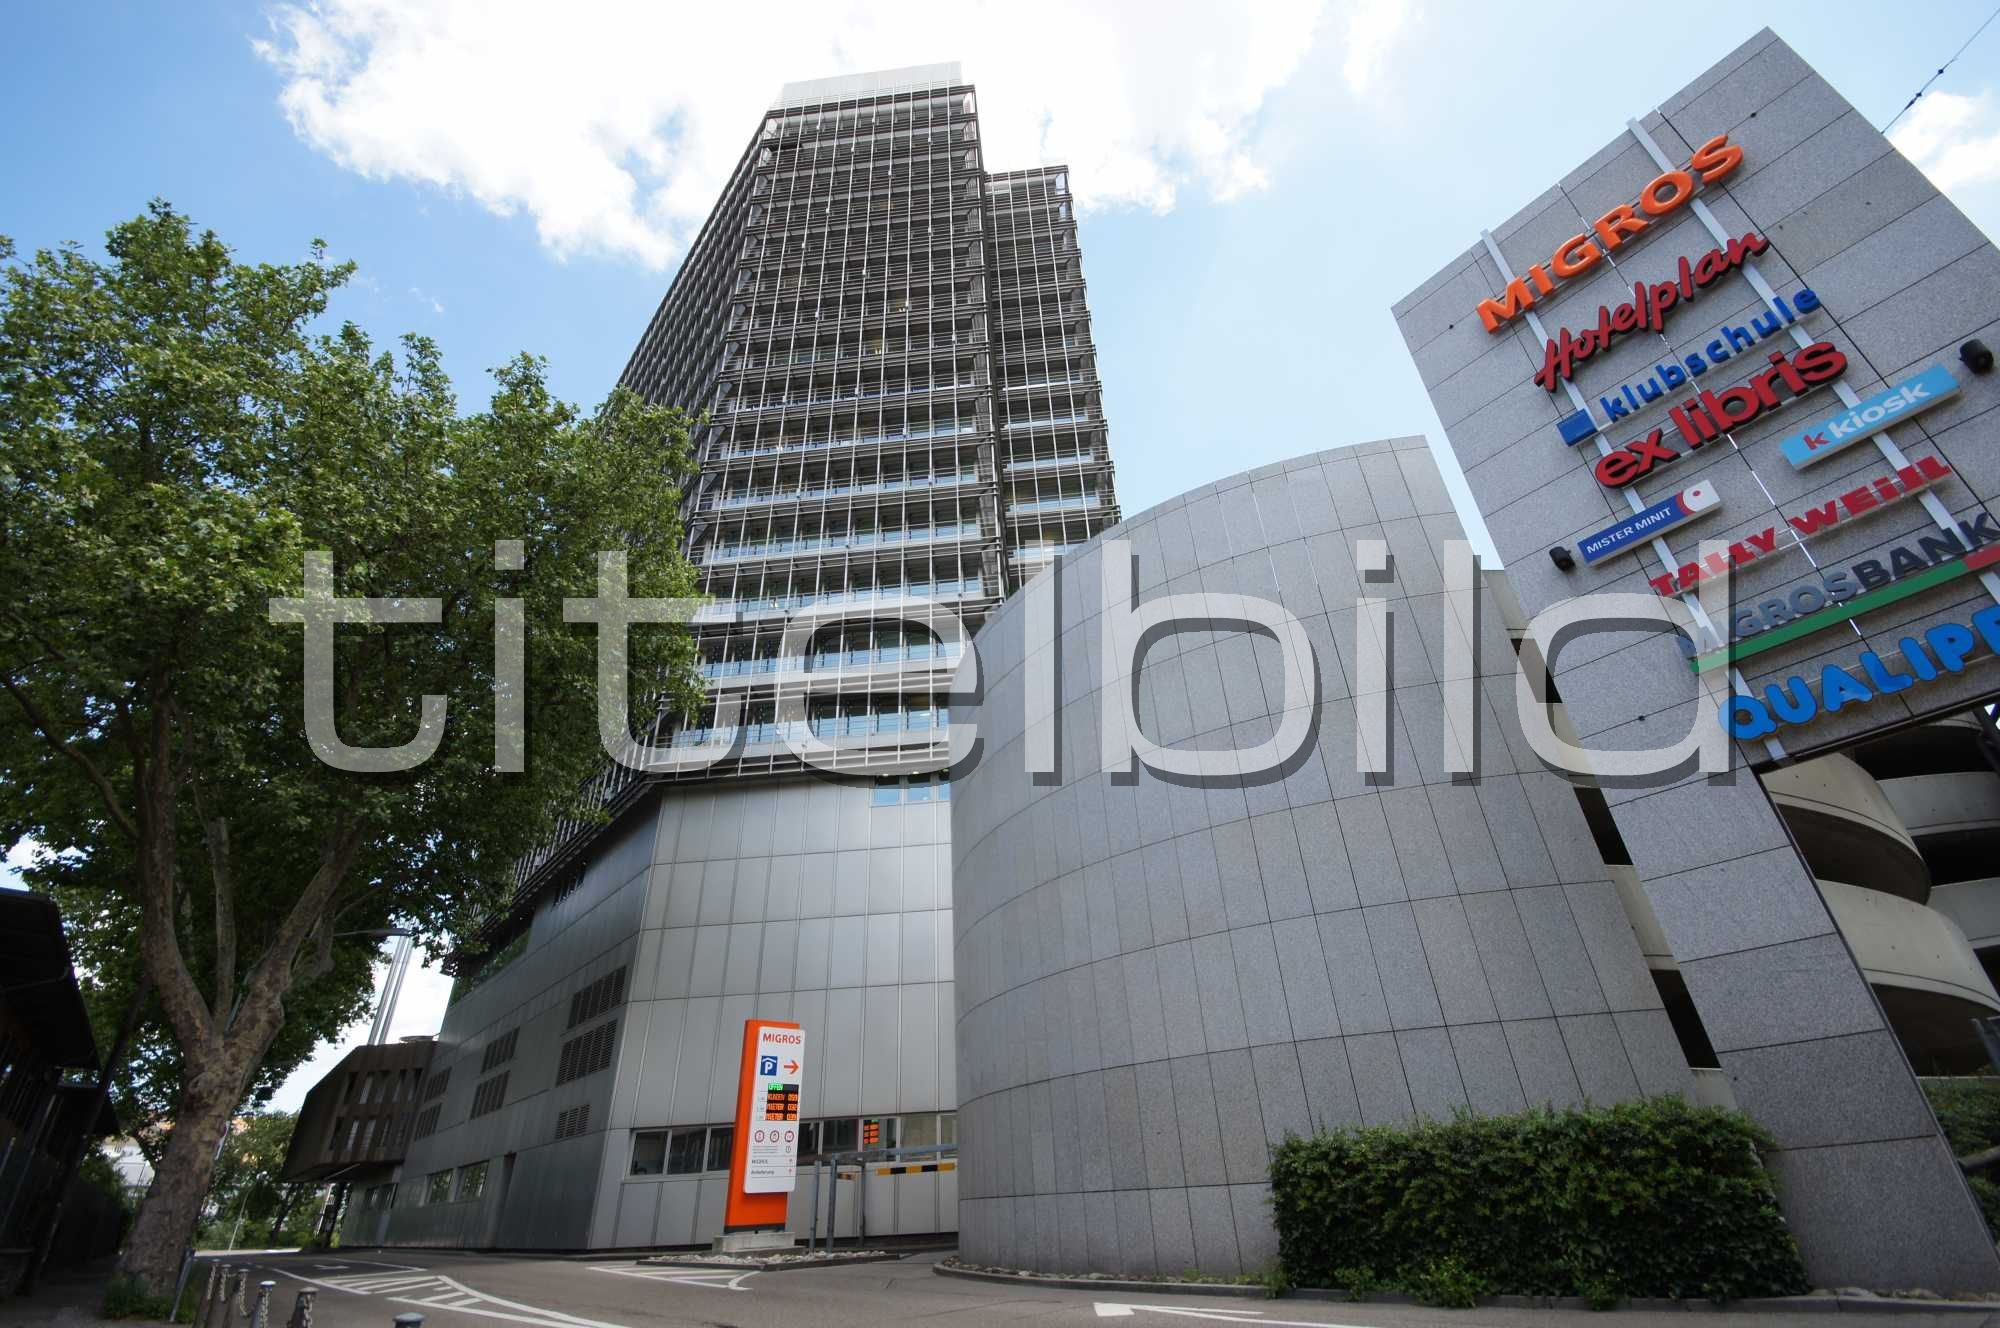 Projektbild-Nr. 0: Umbau/Sanierung Migros Hochhaus 4